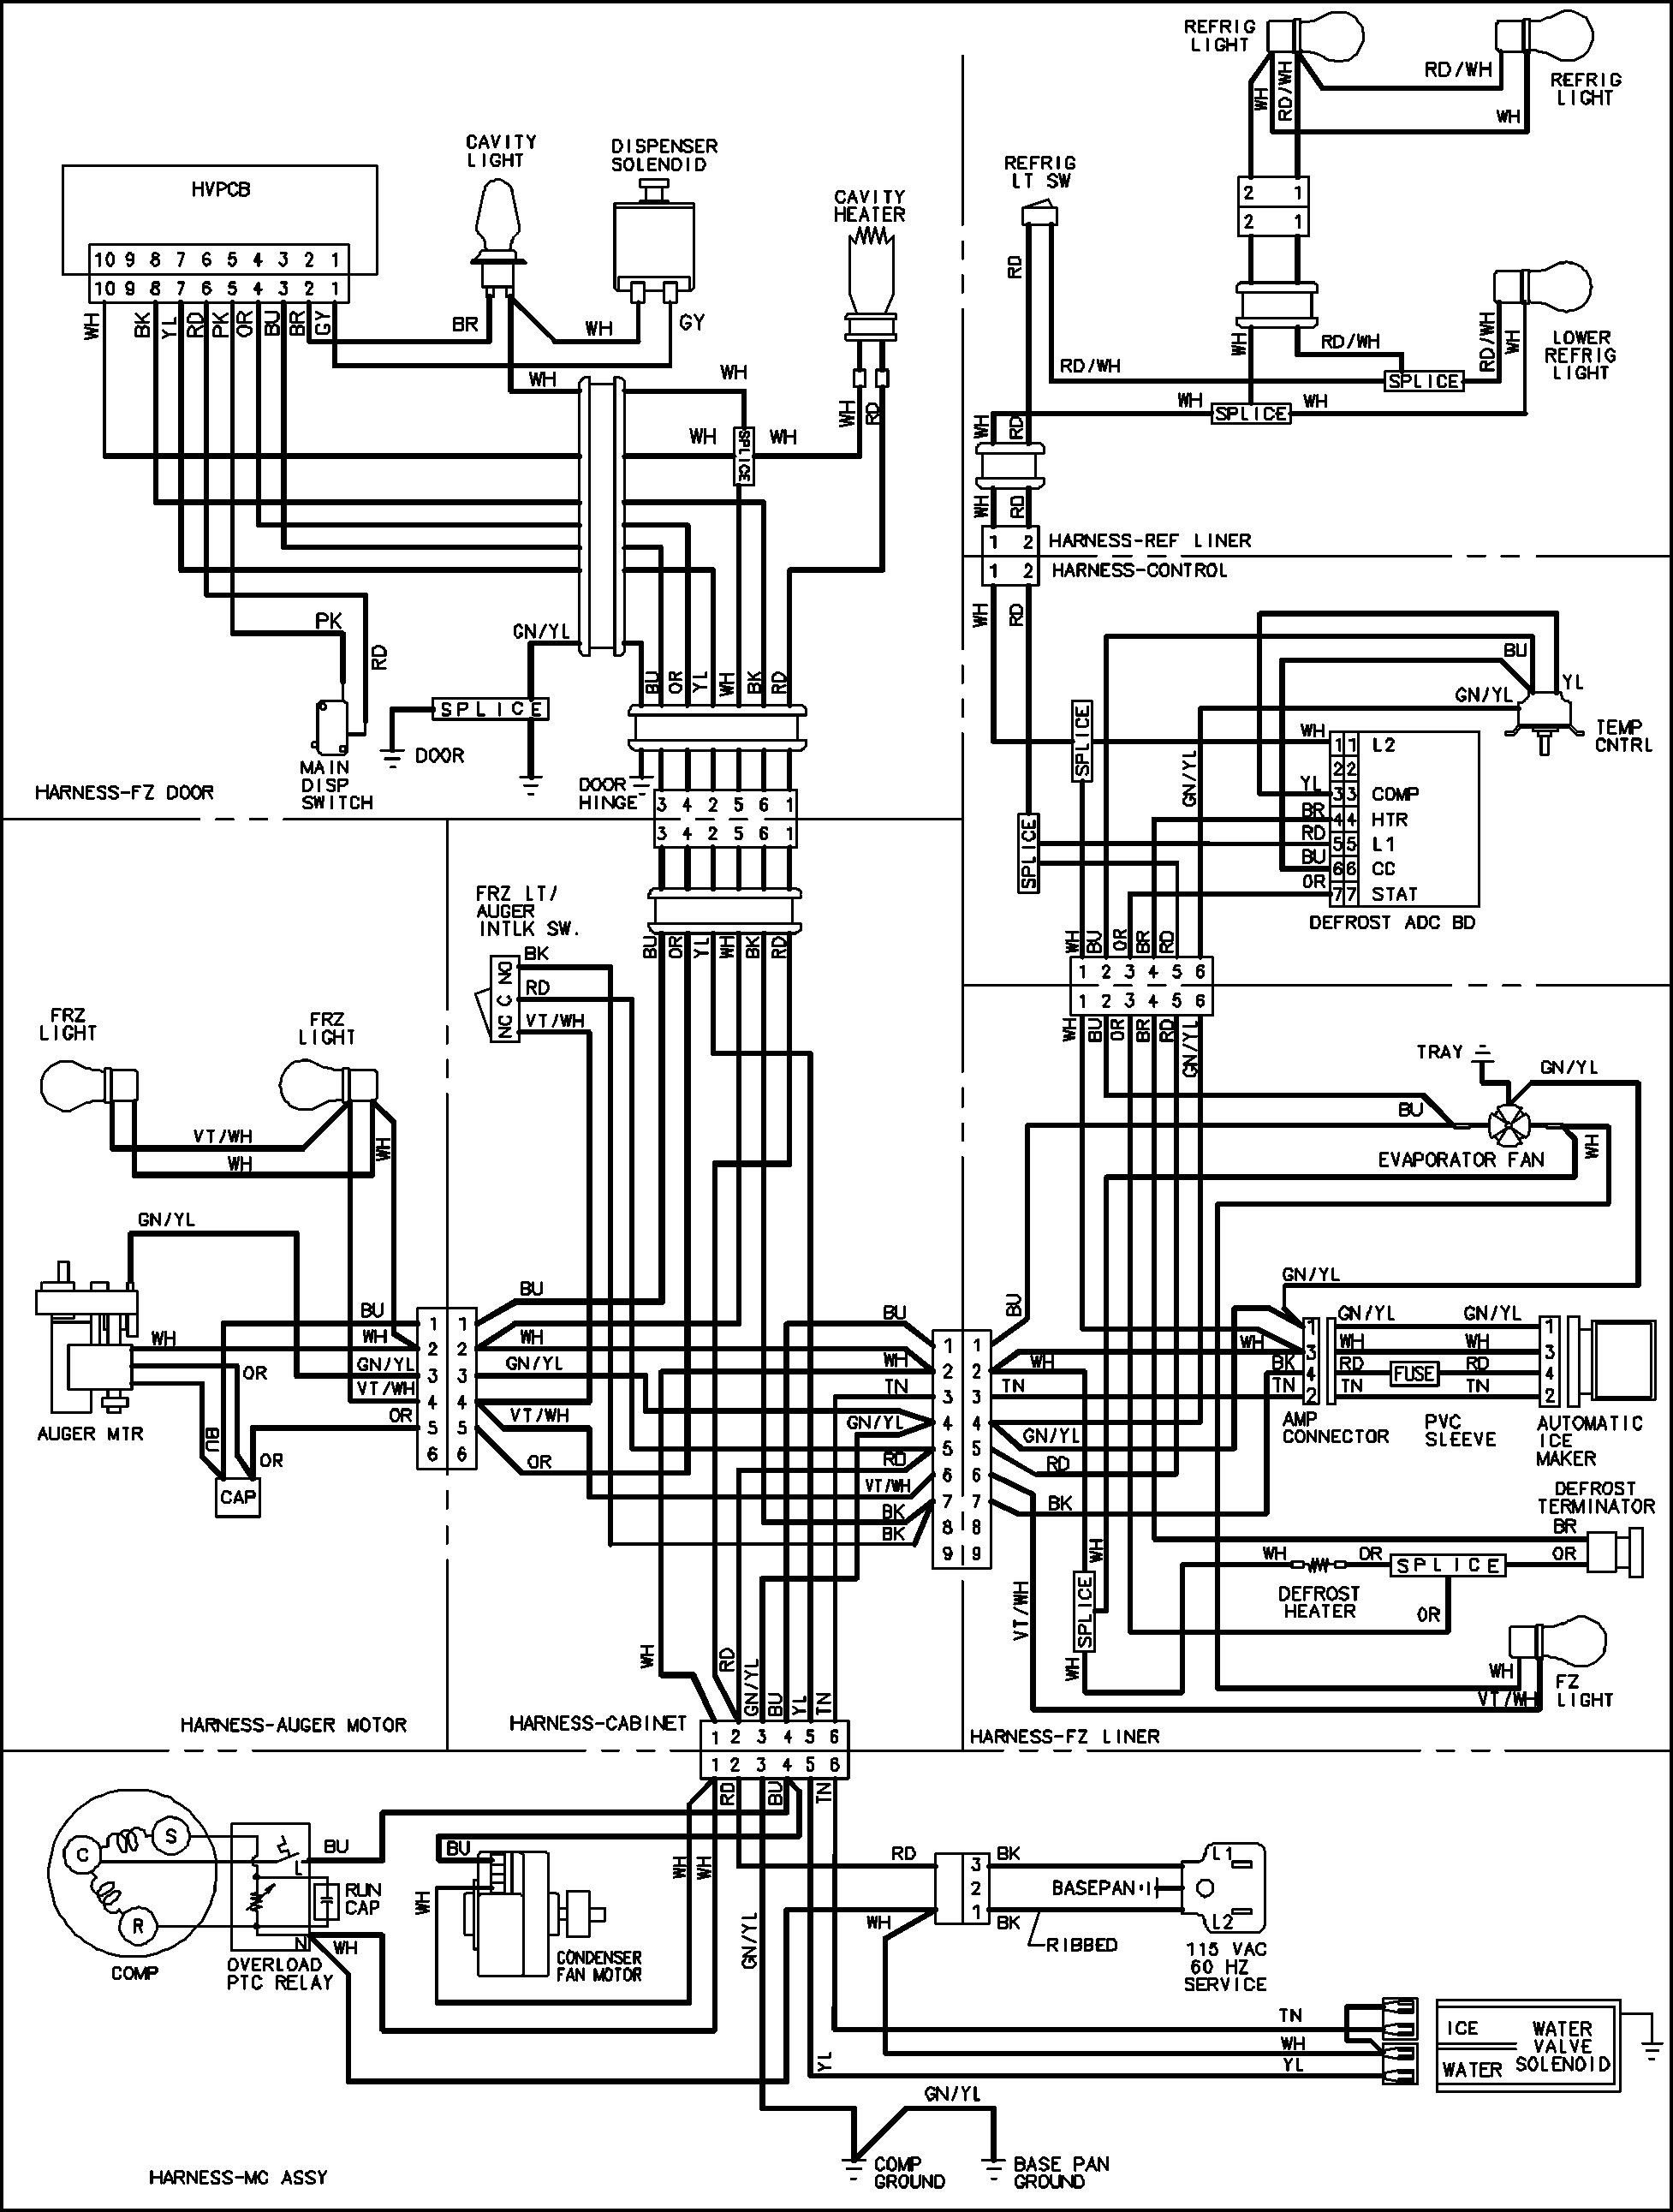 ST_5006] Vintage Refrigerator Wiring Diagram Free DiagramEffl Peted Romet Tacle Xolia Mohammedshrine Librar Wiring 101